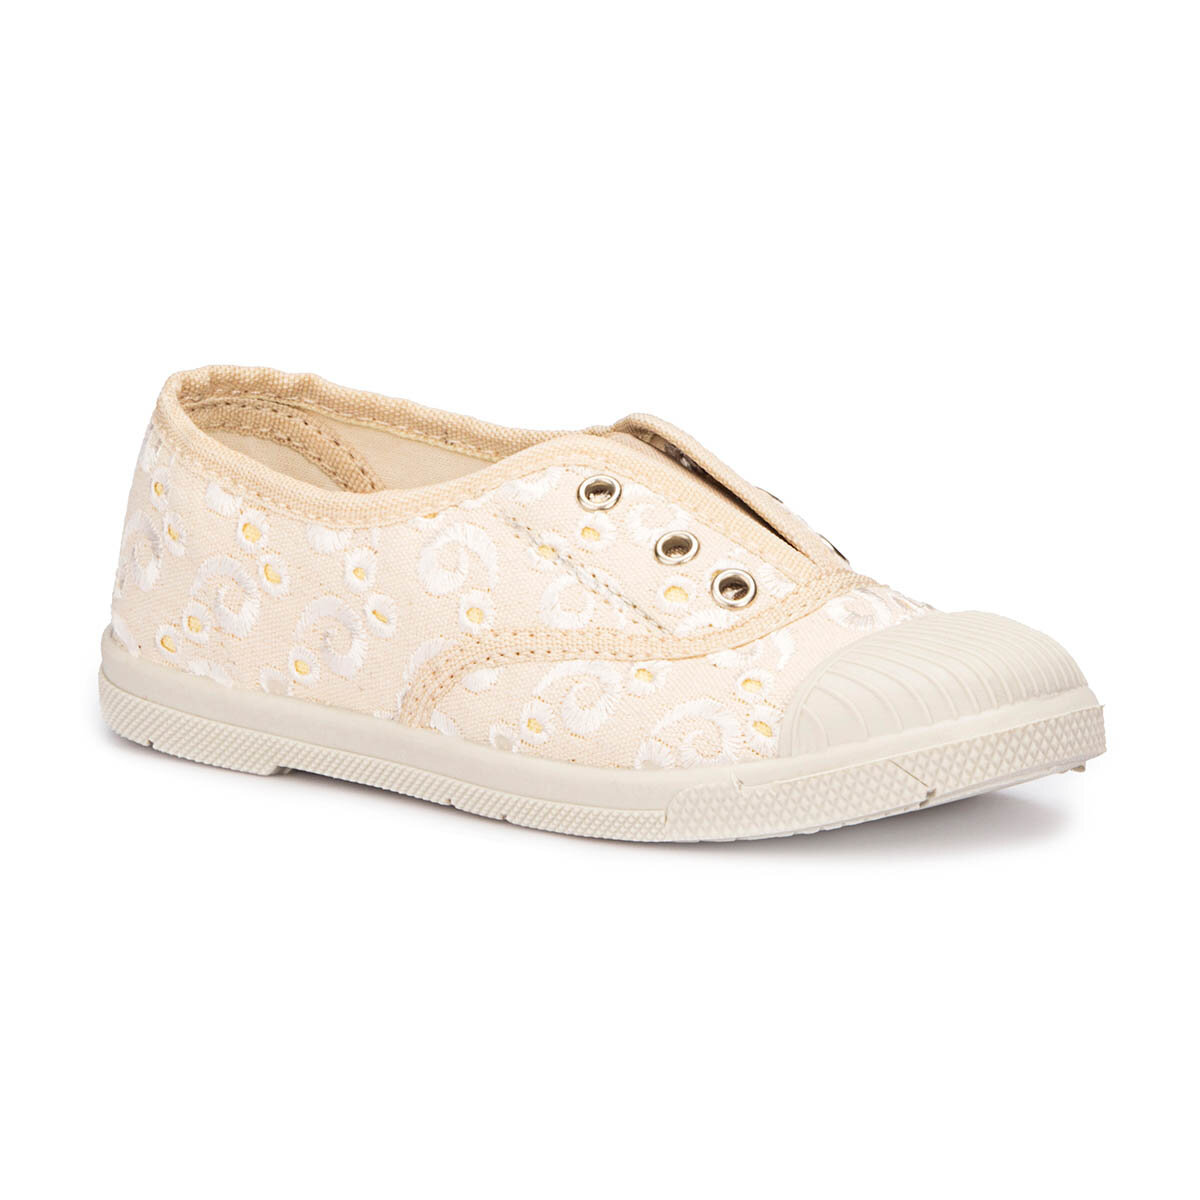 FLO 71.509330.F Beige Female Child Sneaker Shoes Polaris